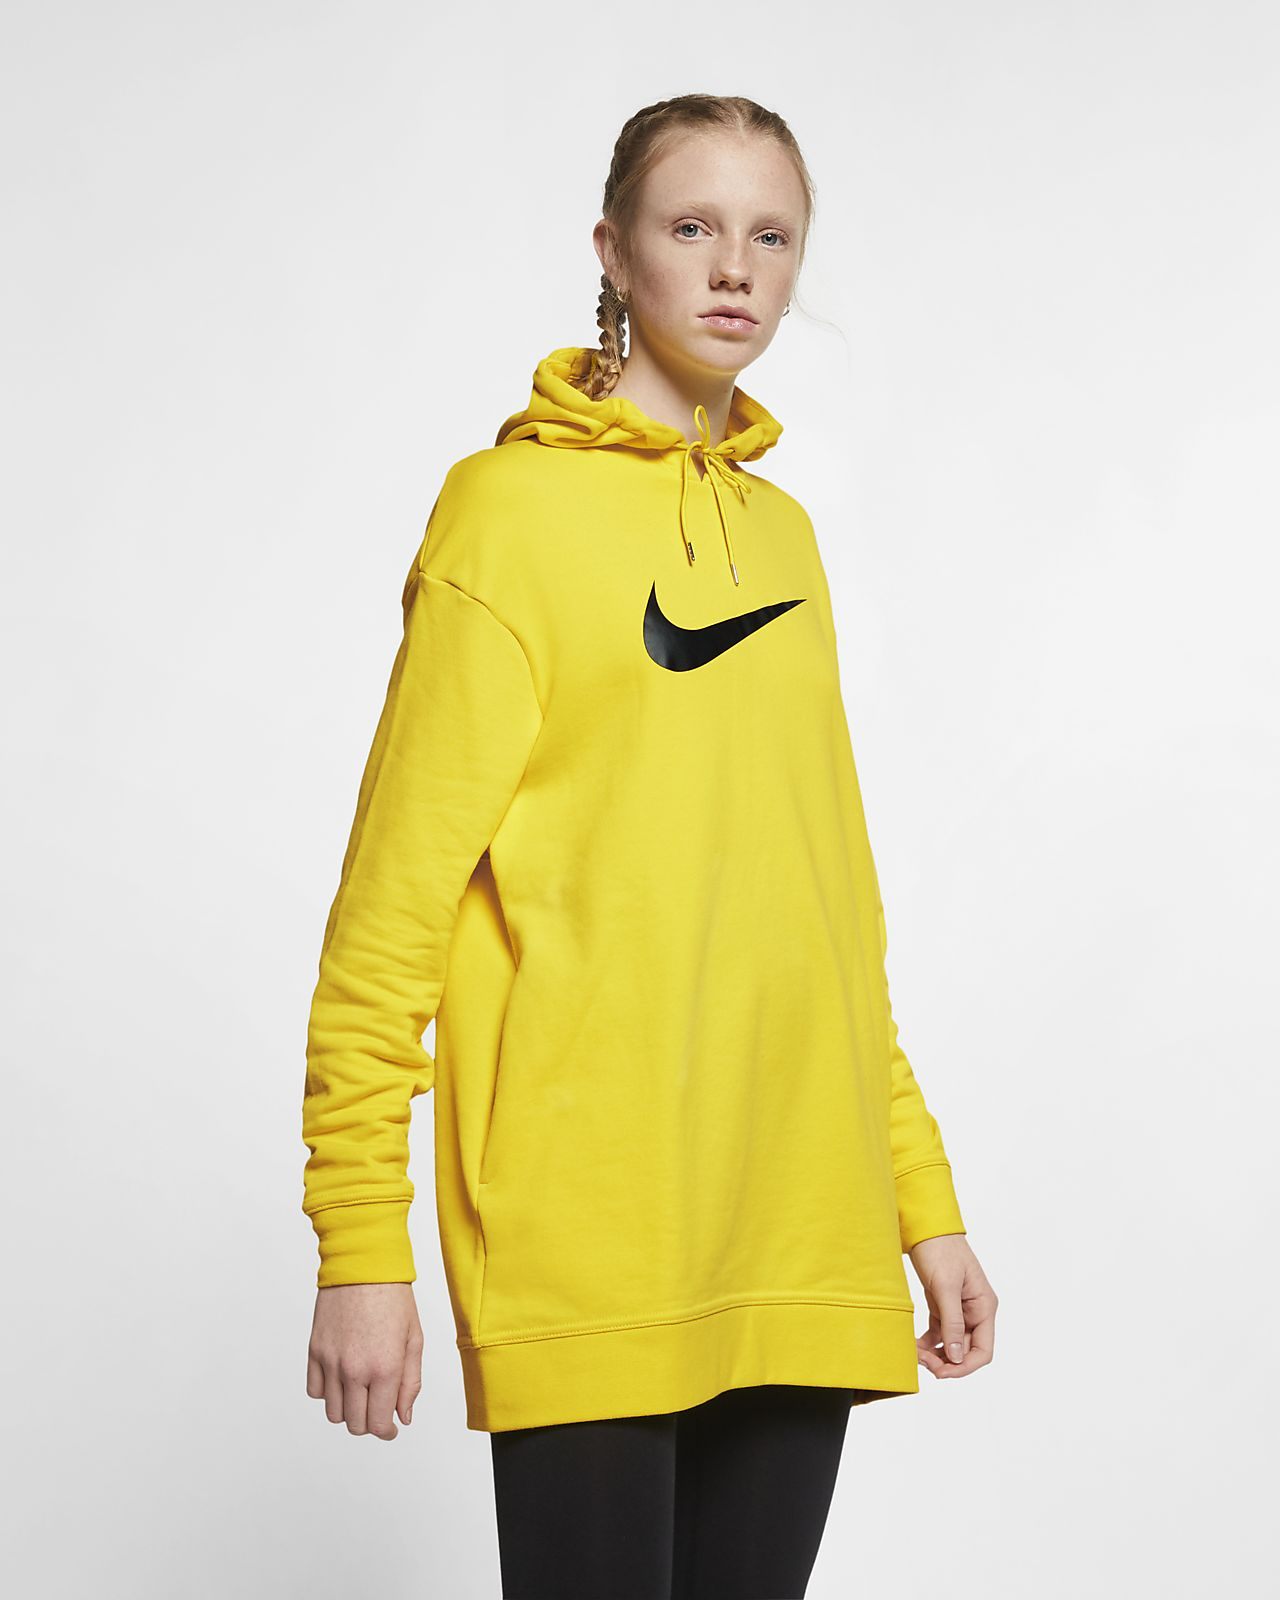 5d996fdbd77c Sweat à capuche en molleton Nike Sportswear Swoosh pour Femme. Nike ...